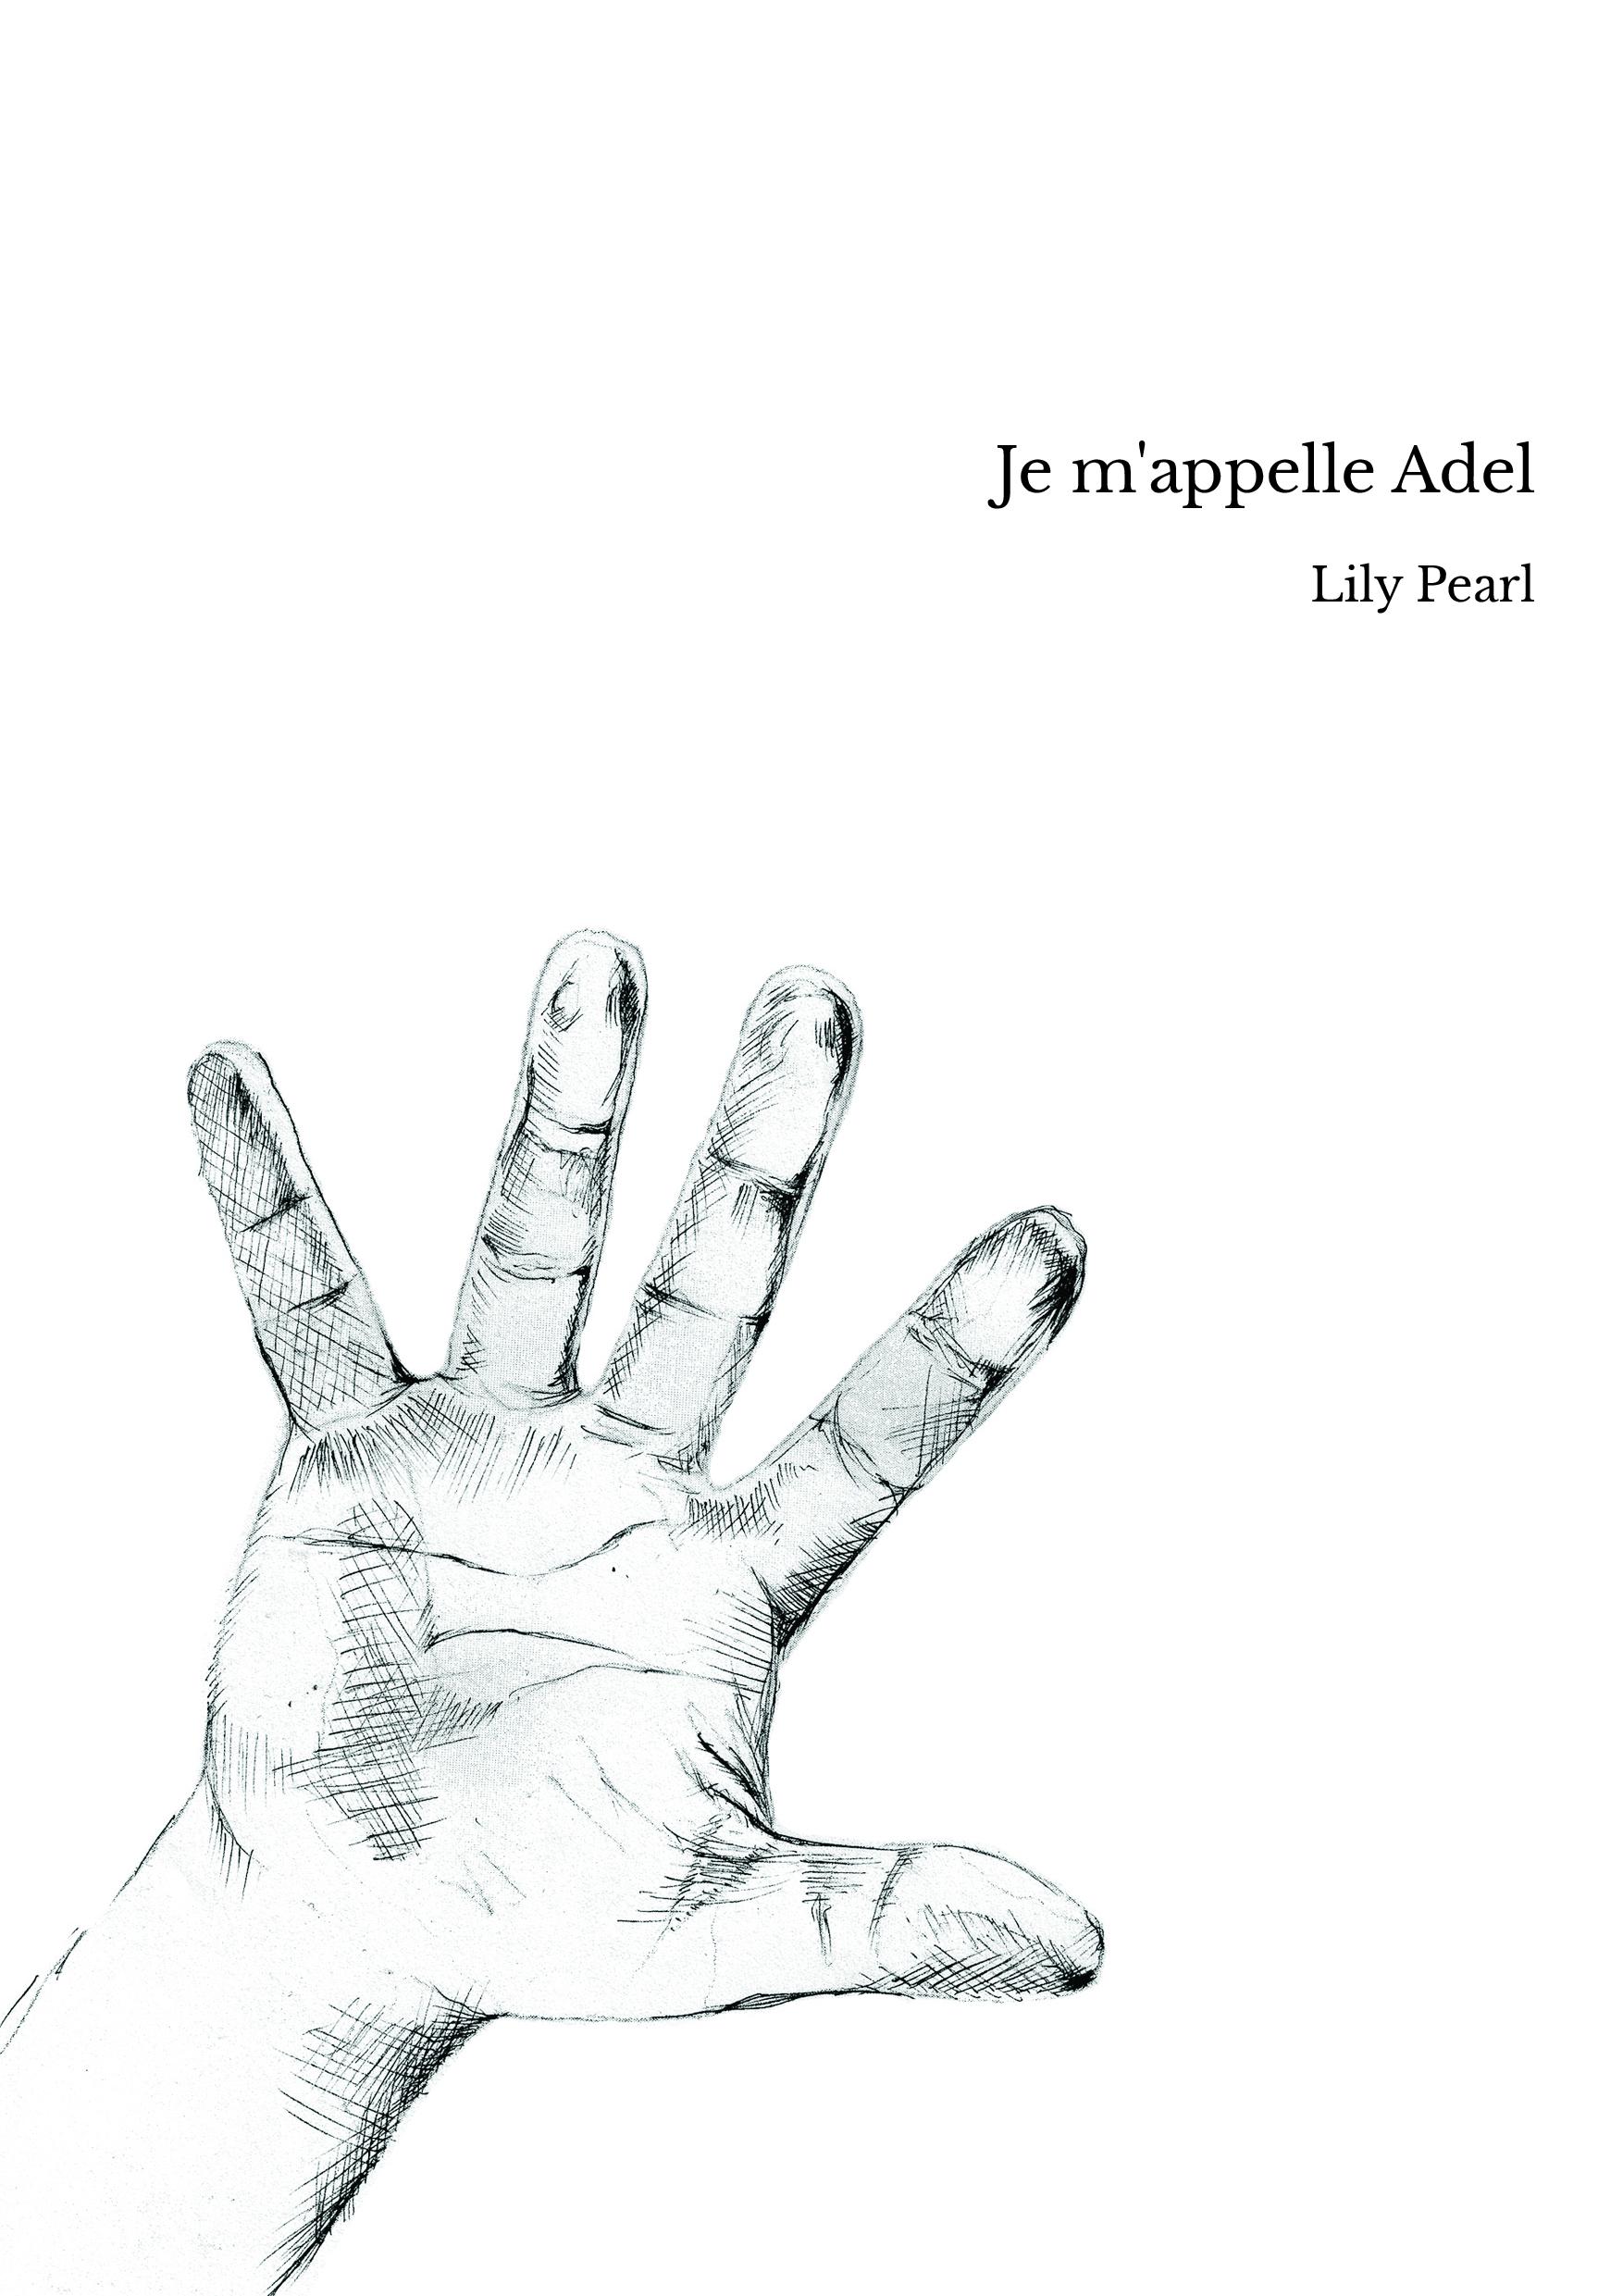 Je m'appelle Adel